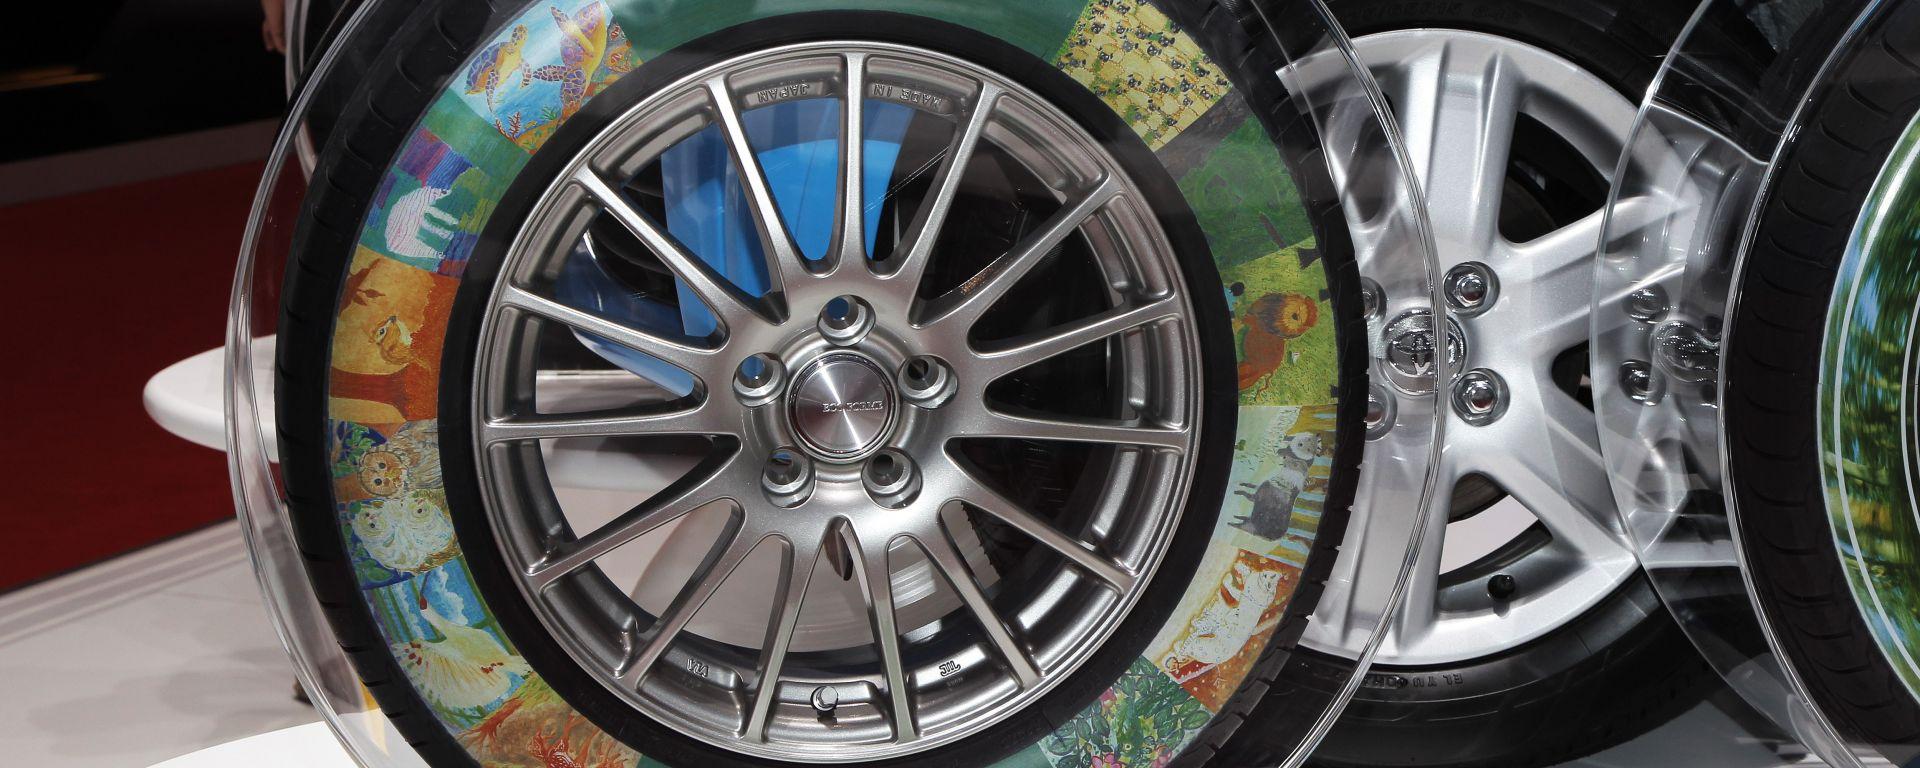 Bridgestone Tyre Printing